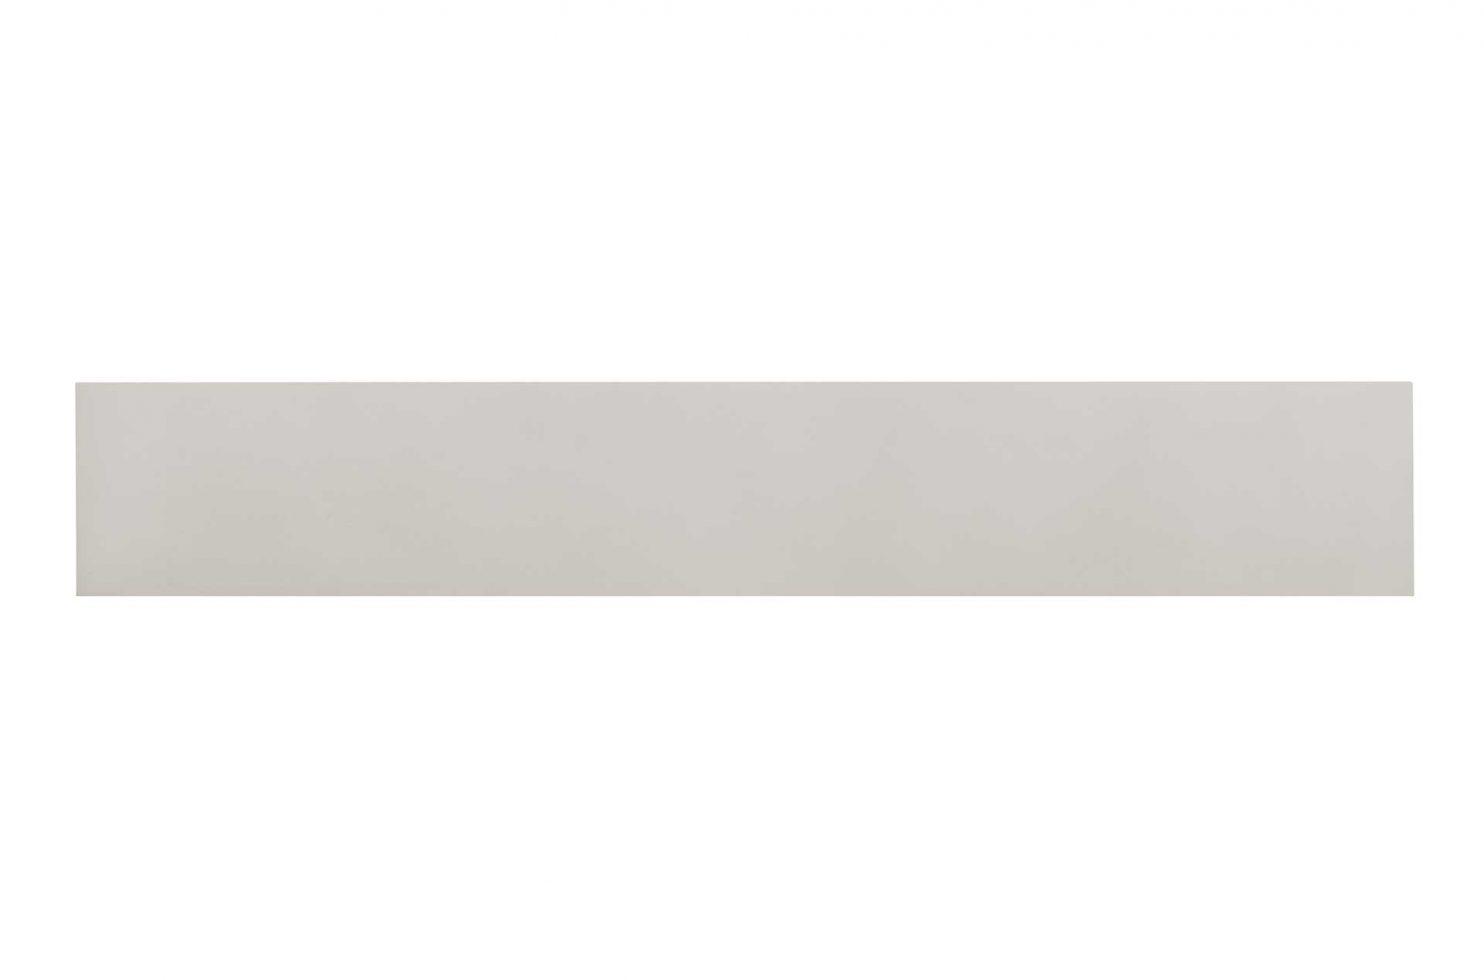 prov frp meditation rectangle bench S1568100215 top web